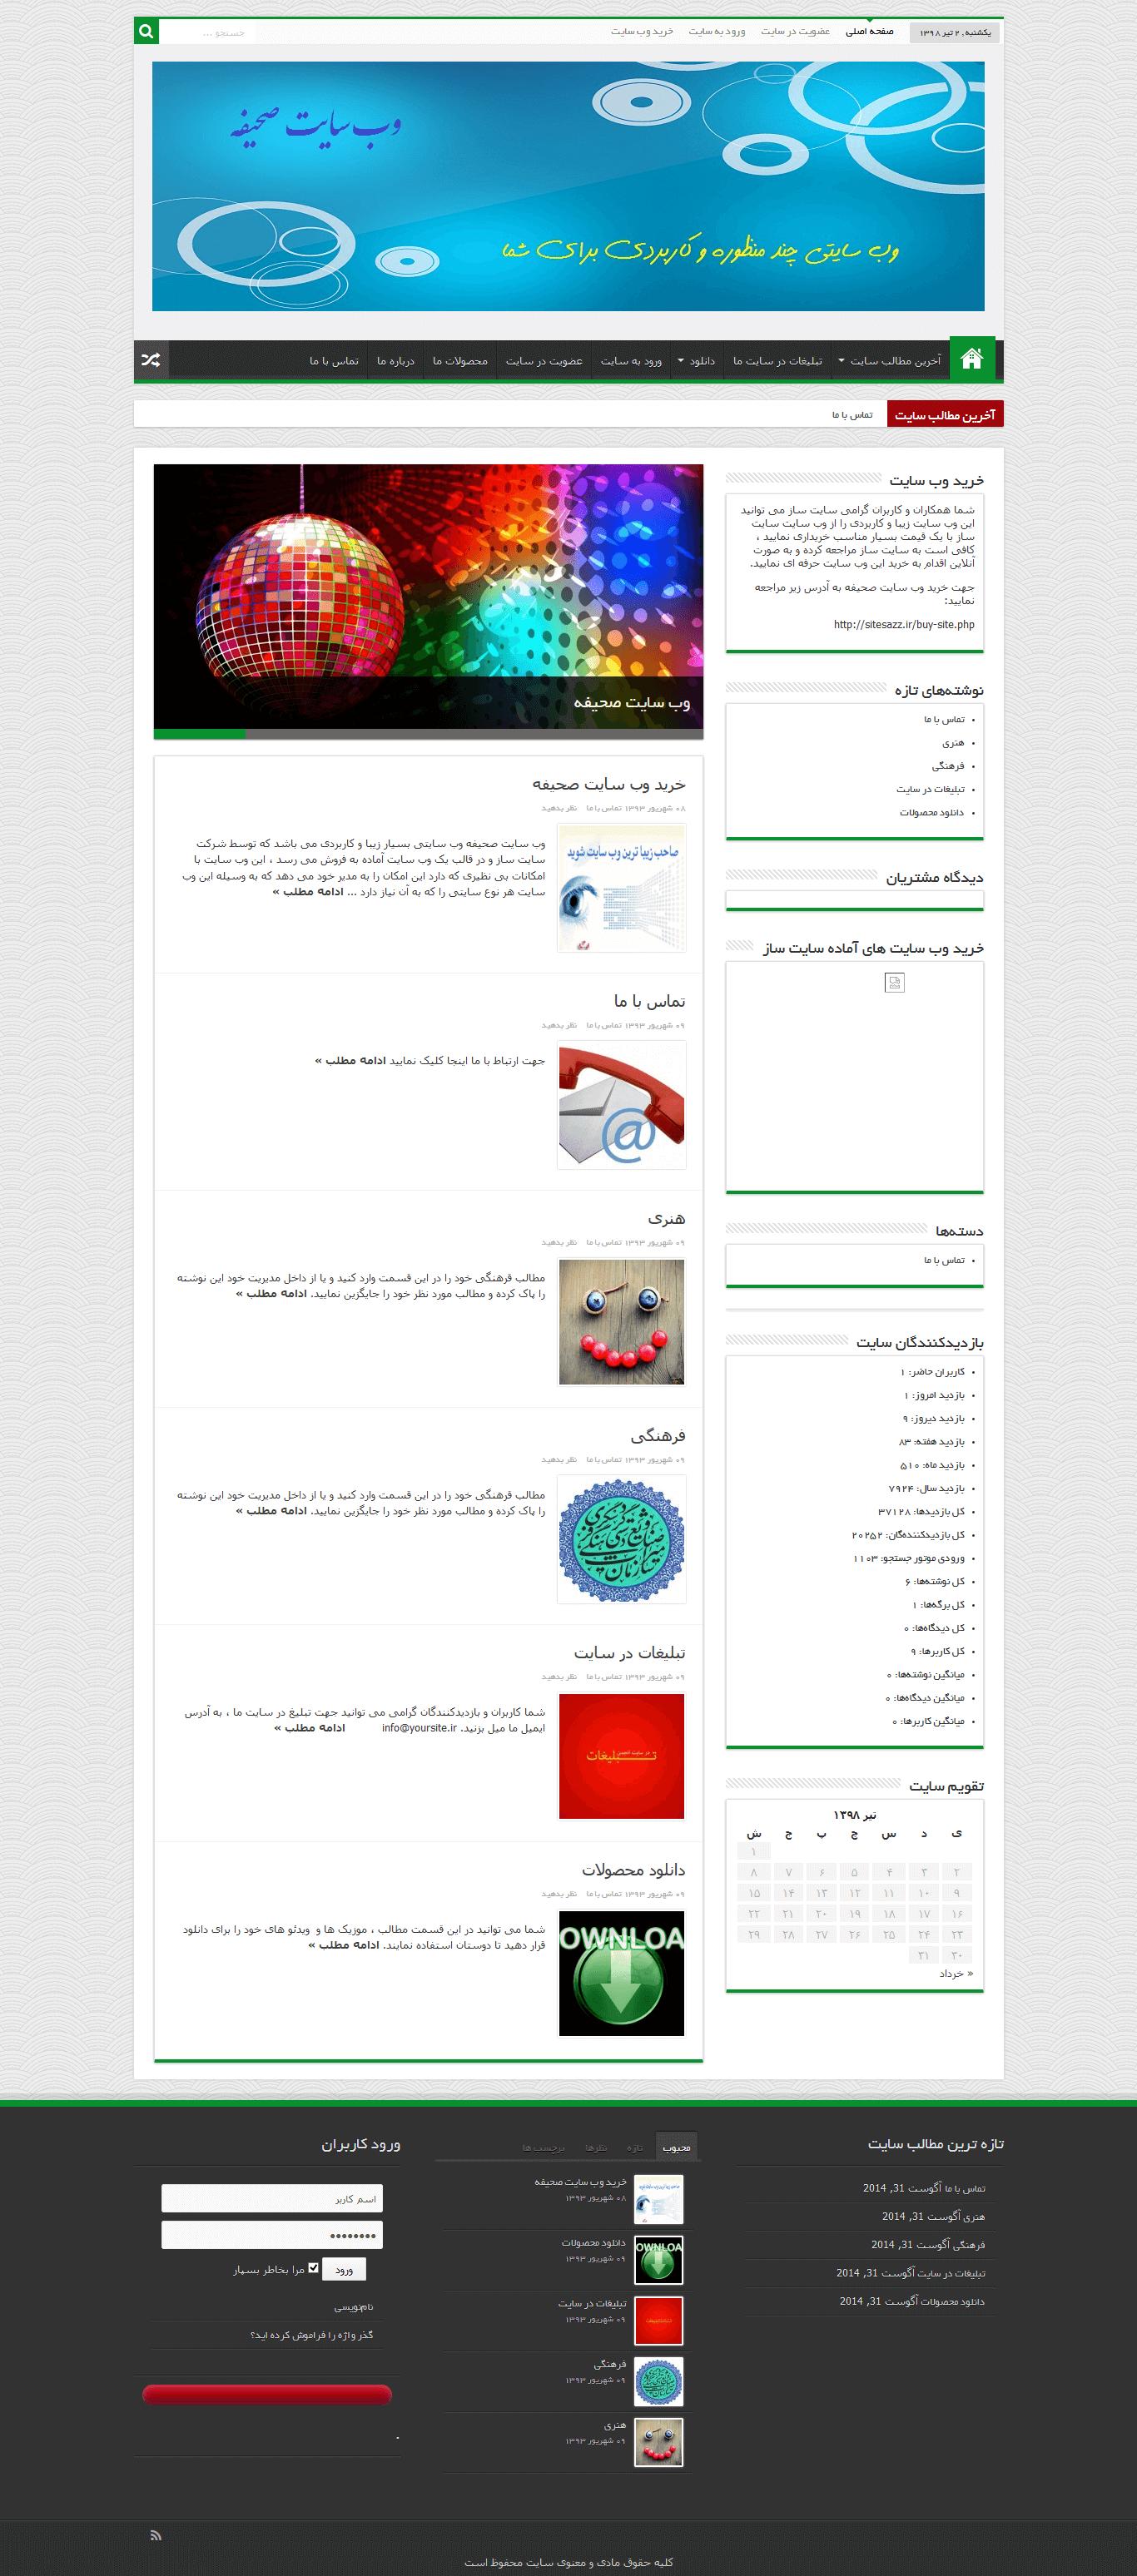 حالت دسکتاپ سایت صحیفه